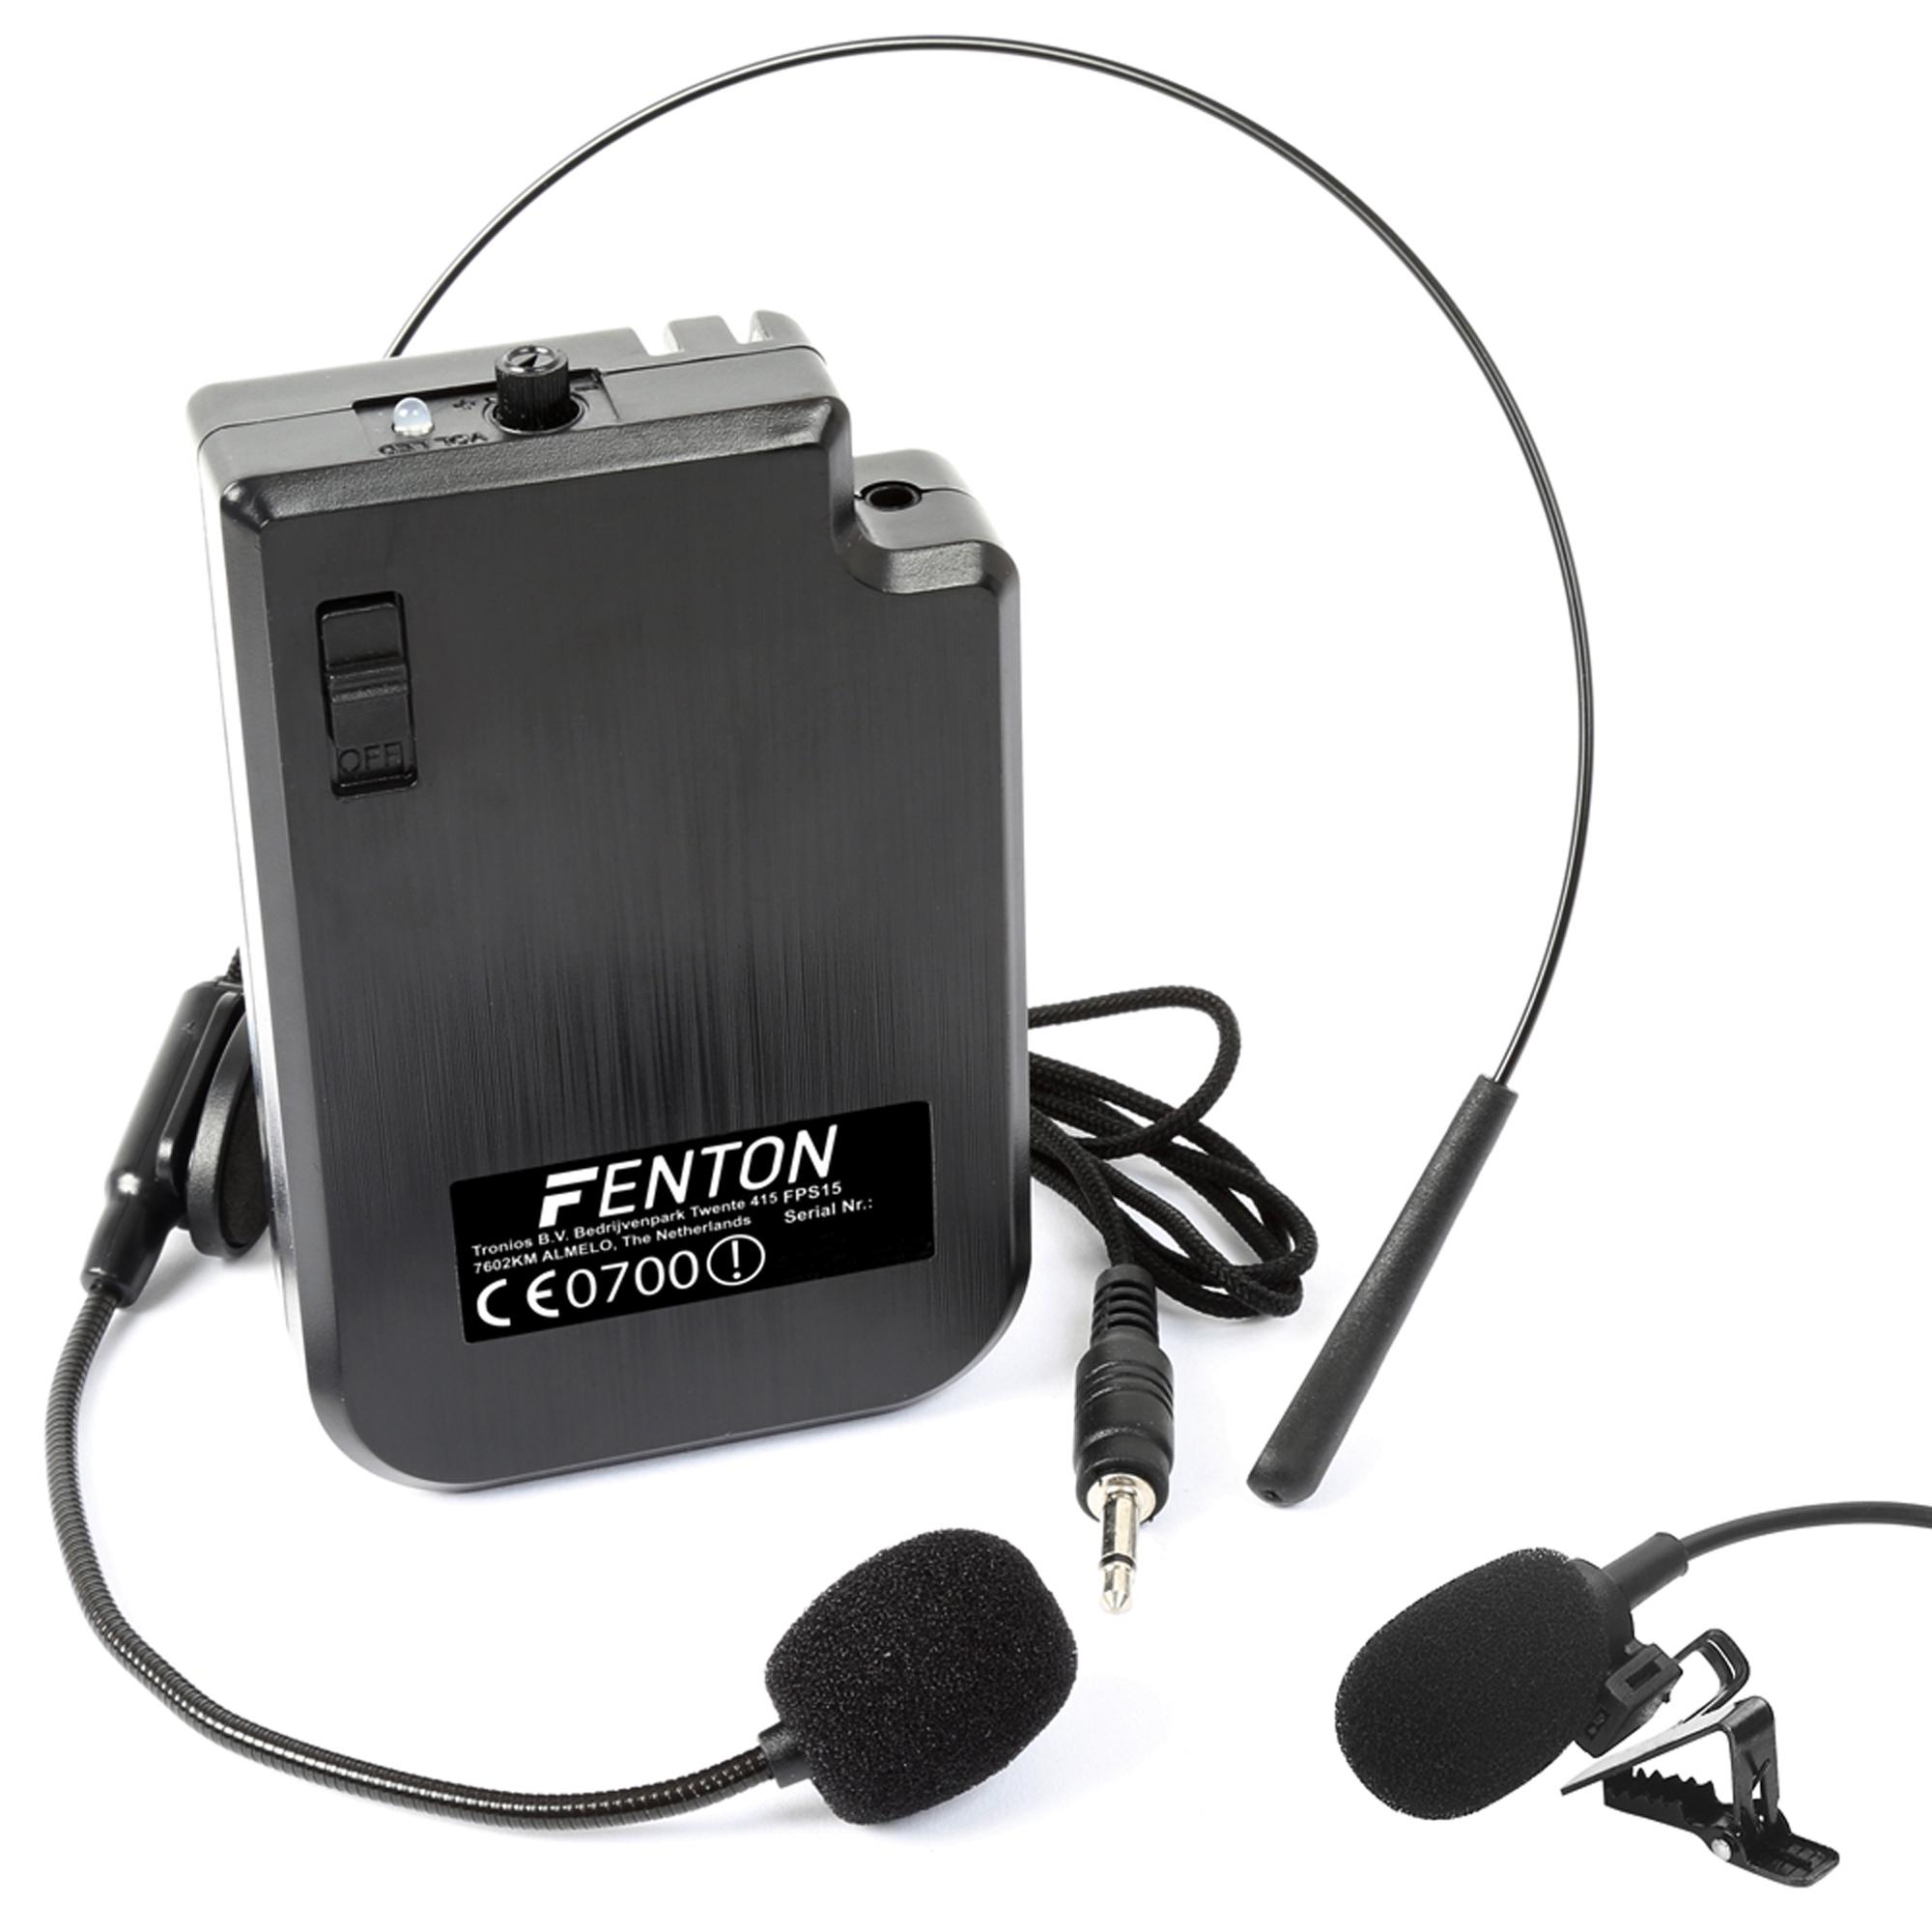 Wireless VHF Microphone Headset Bodypack - Transmitter Only